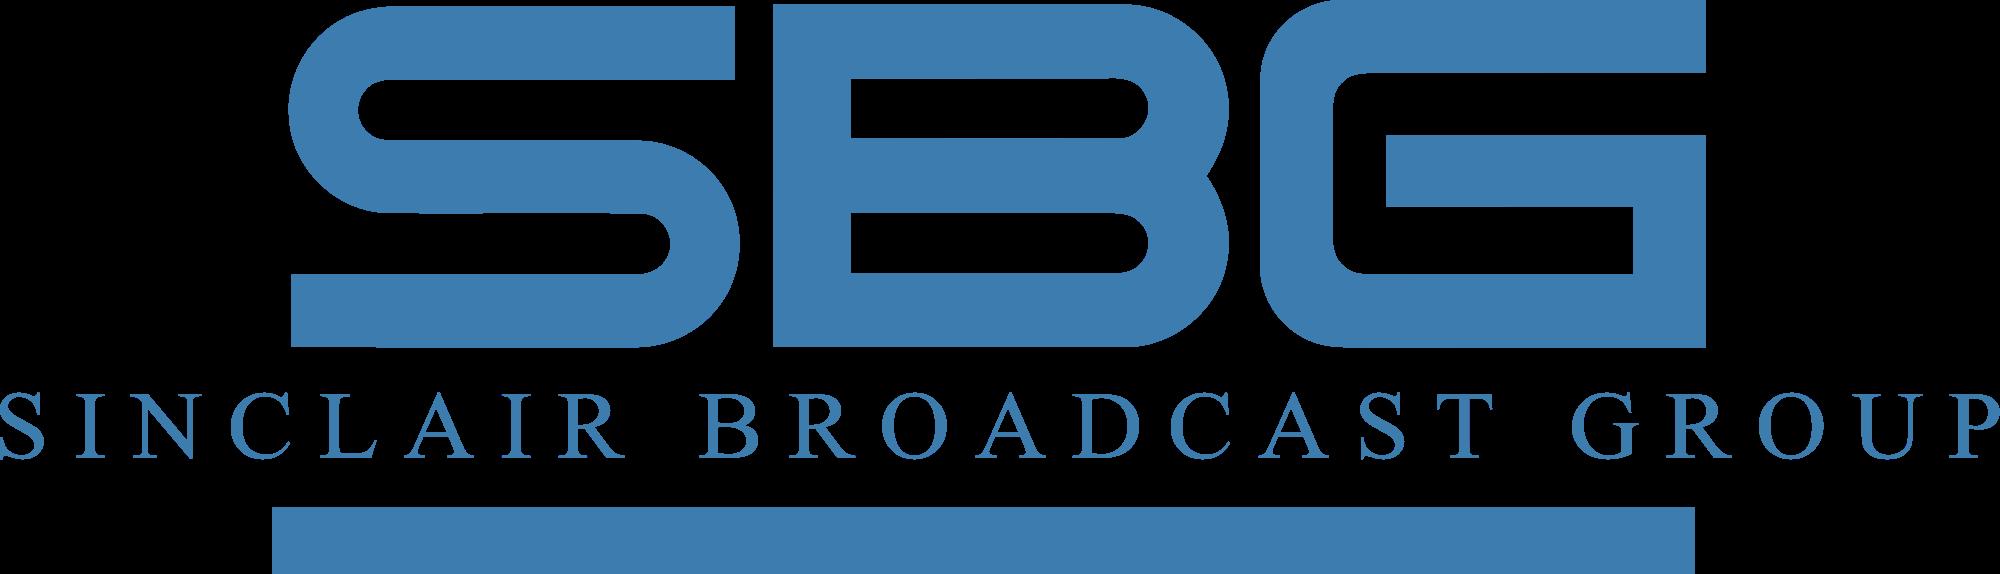 Sinclair Broadcast Group Inc. (SBGI)